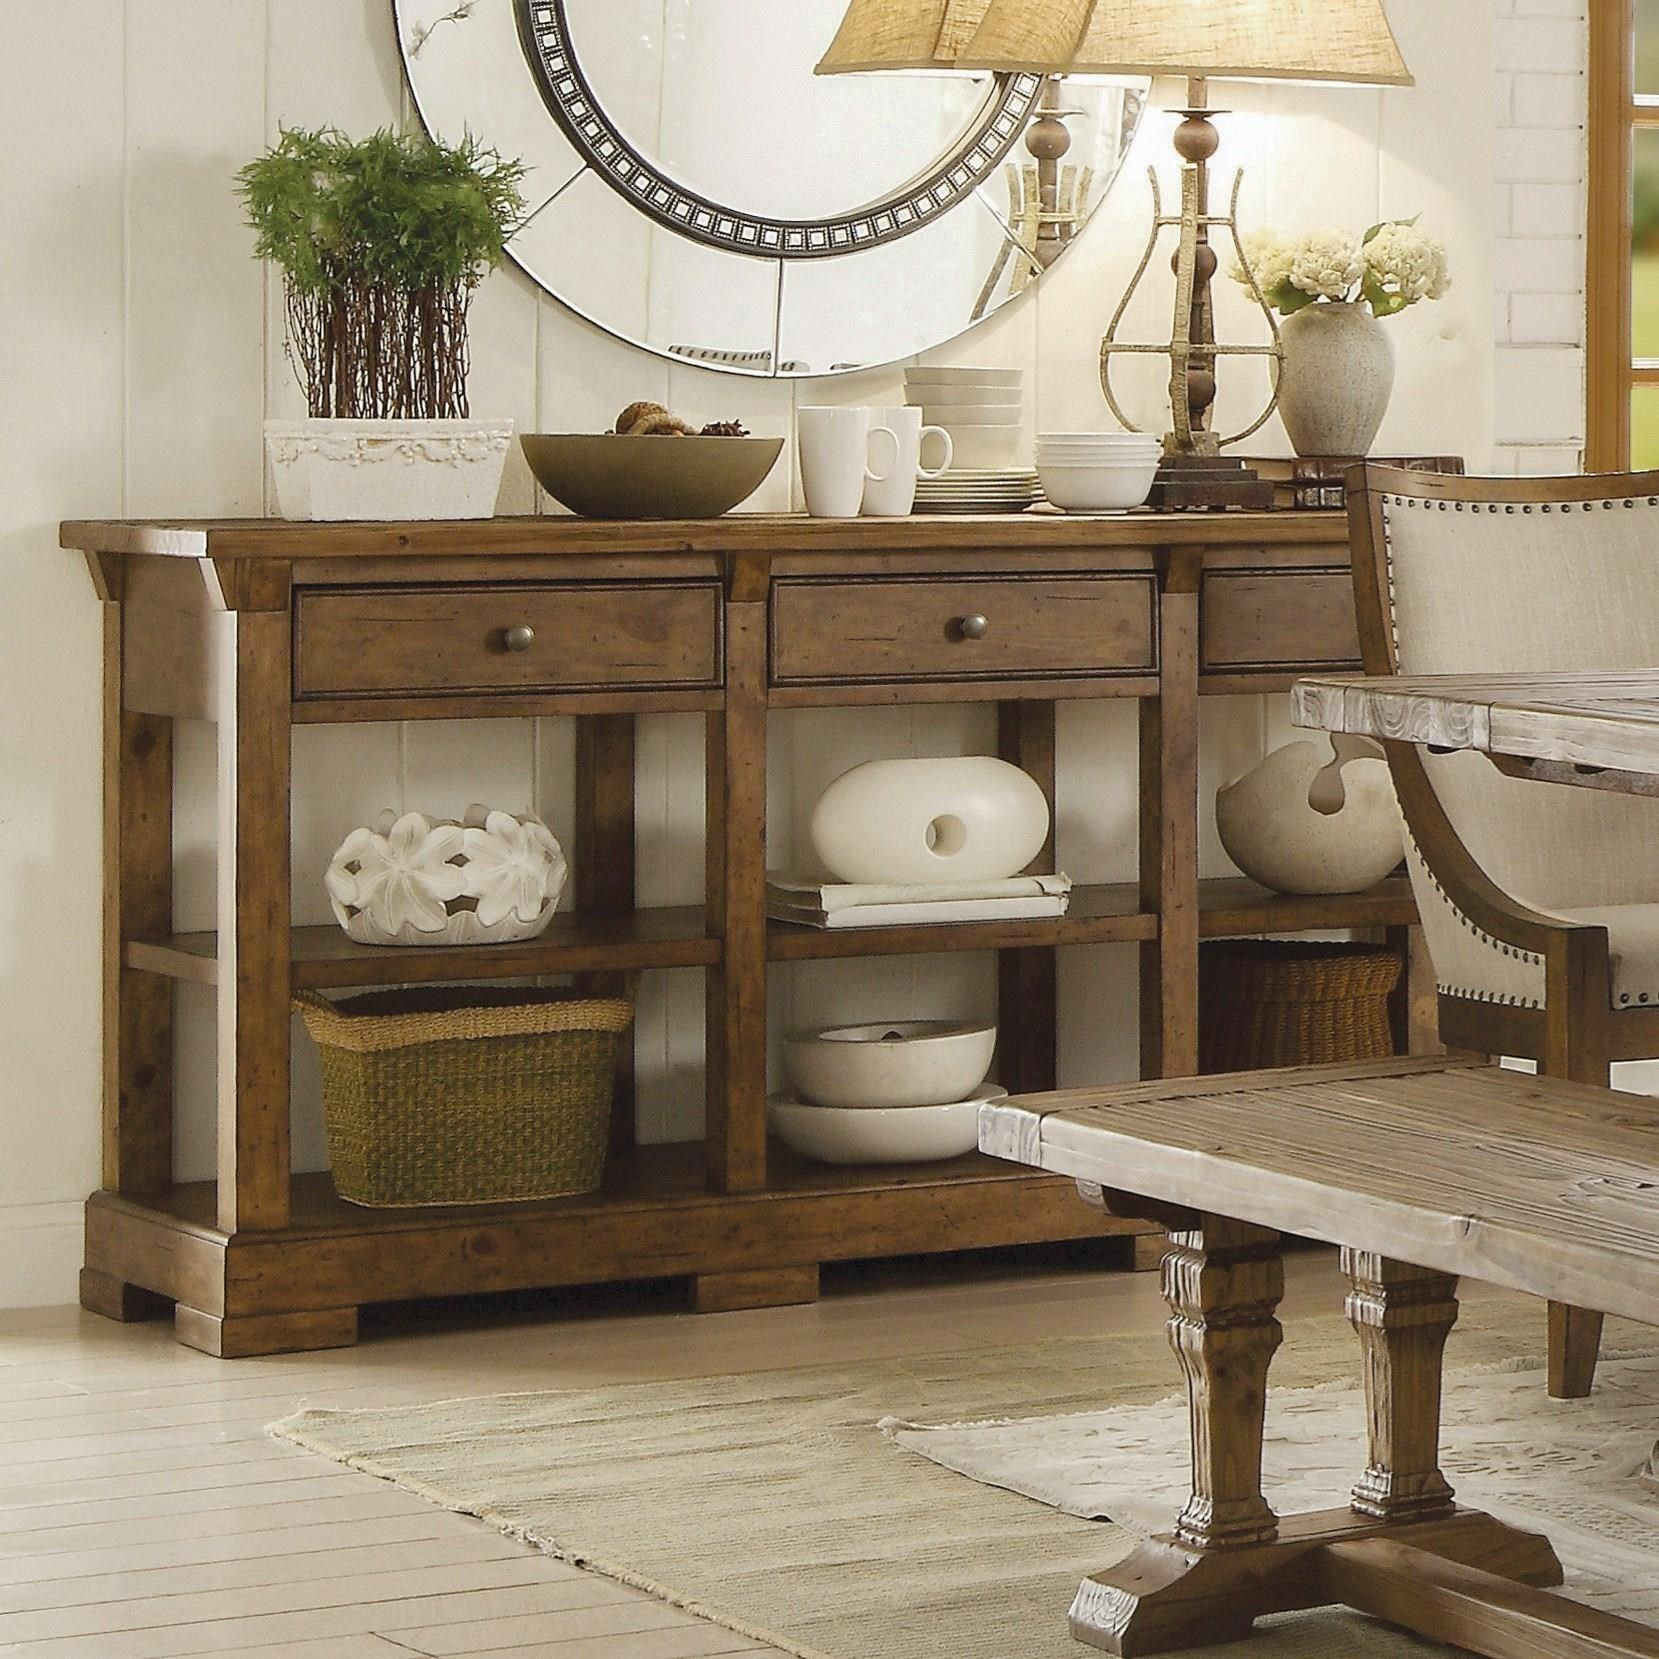 Hawthorne Buffet by Riverside Furniture at Dunk & Bright Furniture